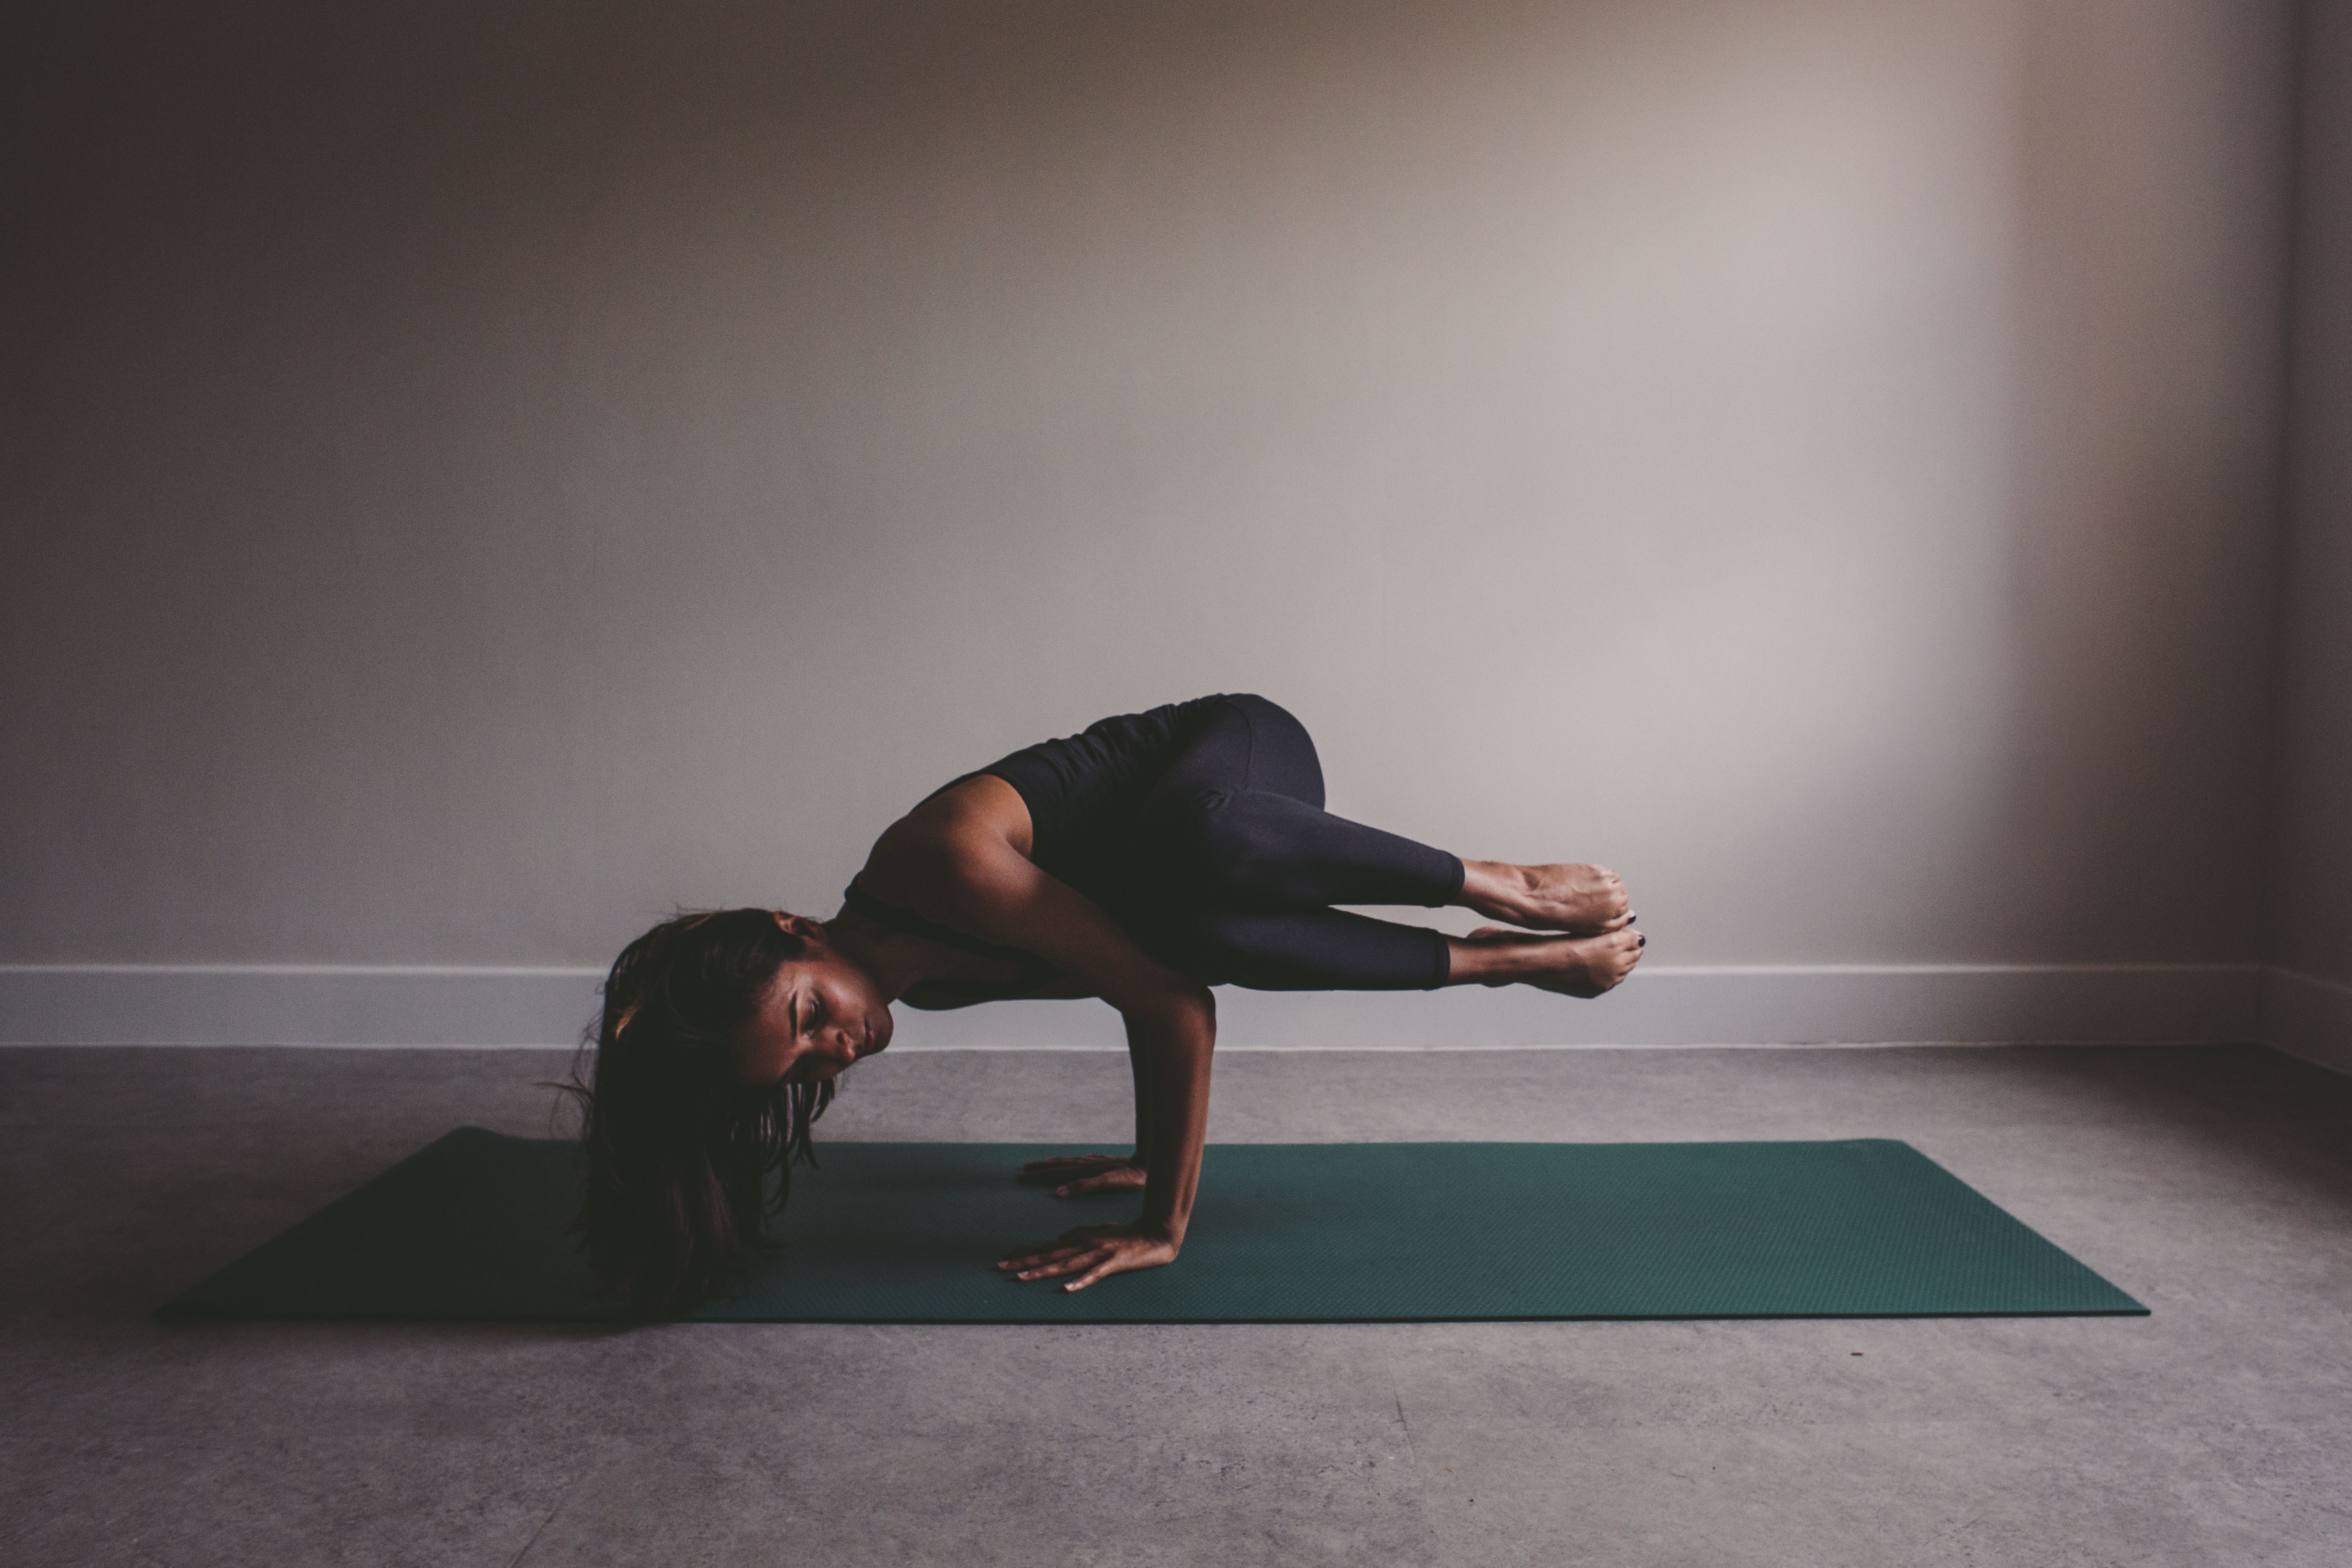 Yoga Pose Priya Halai Harrow Watford Stanmore